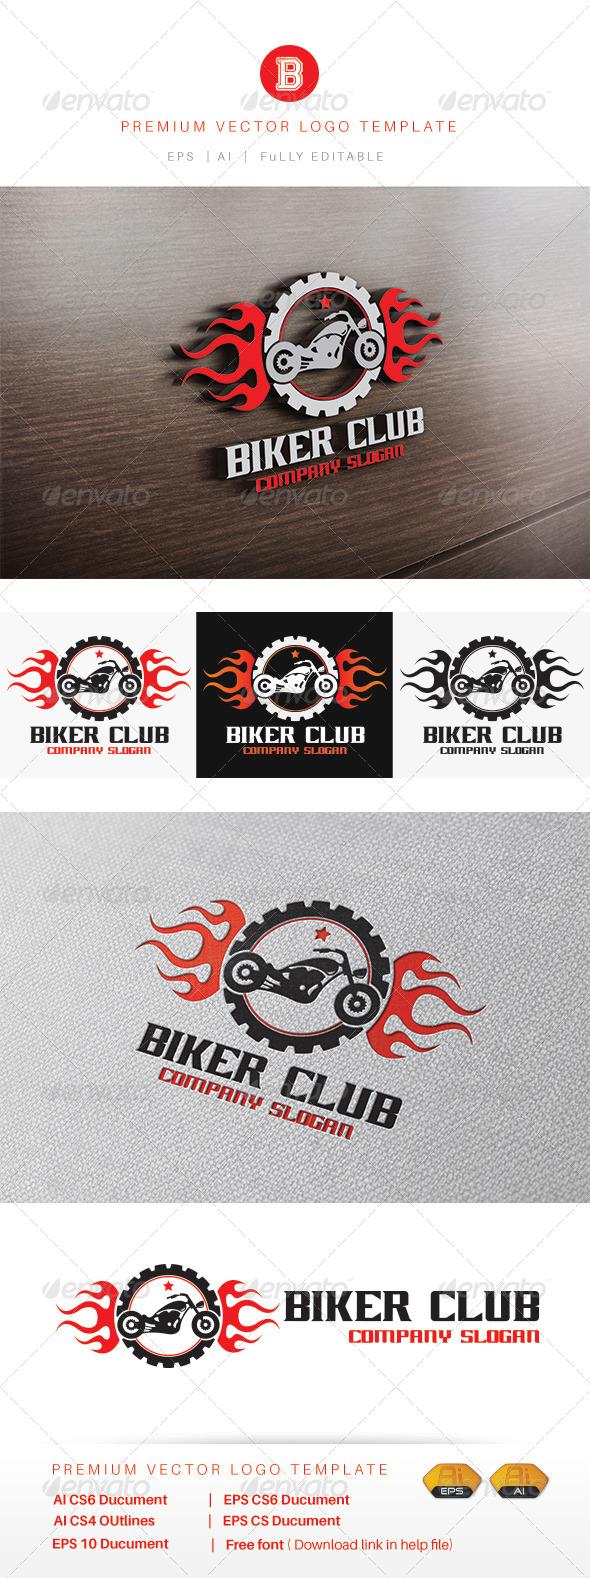 GraphicRiver Biker Club 8510880